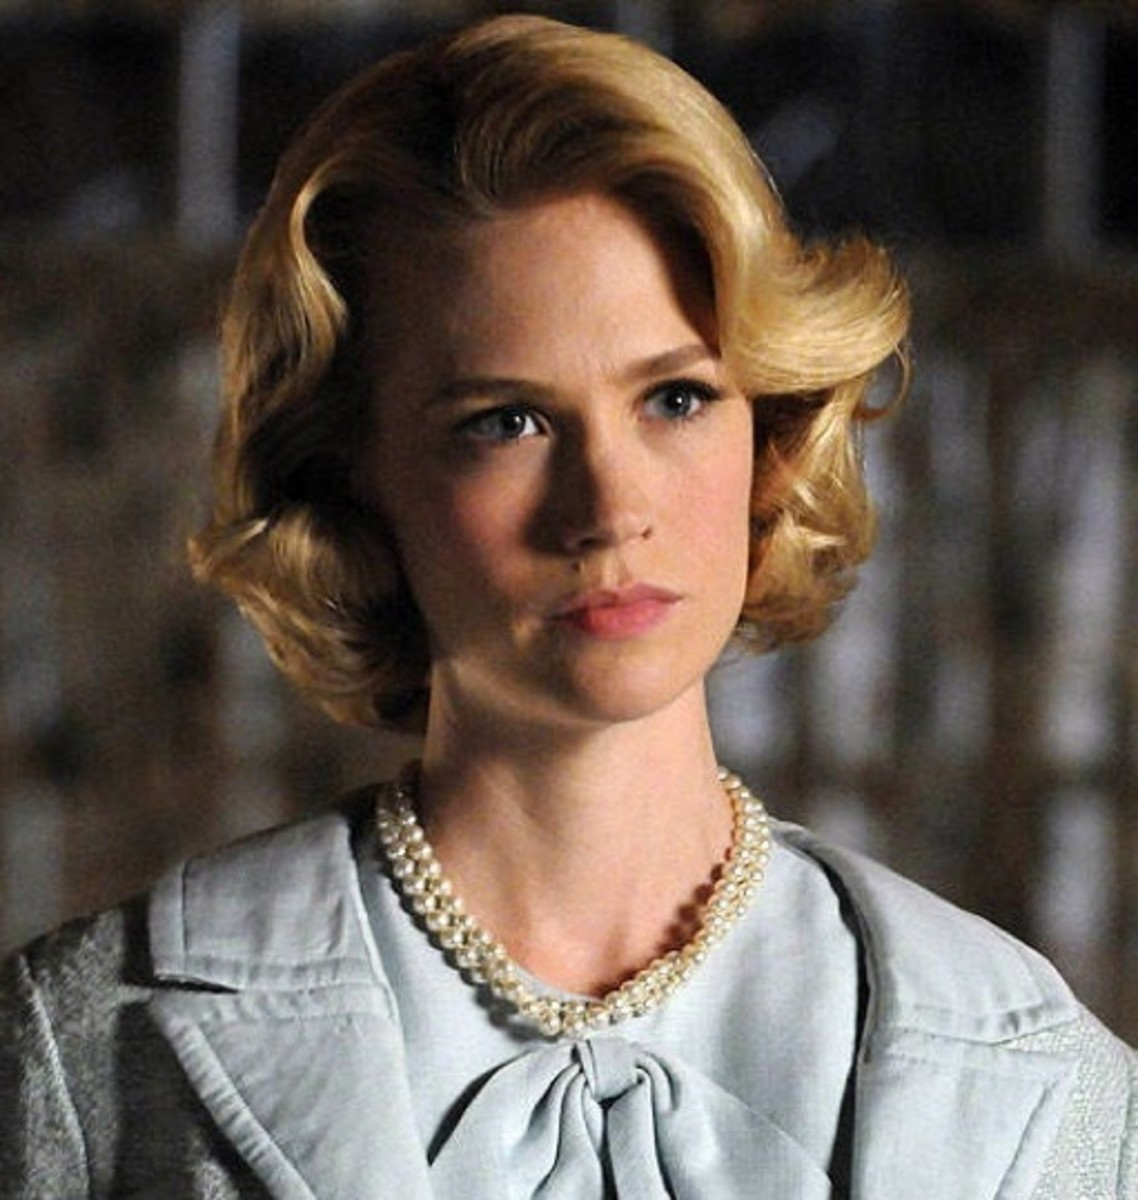 Betty 'Draper' Francis hairstyle in season 4.